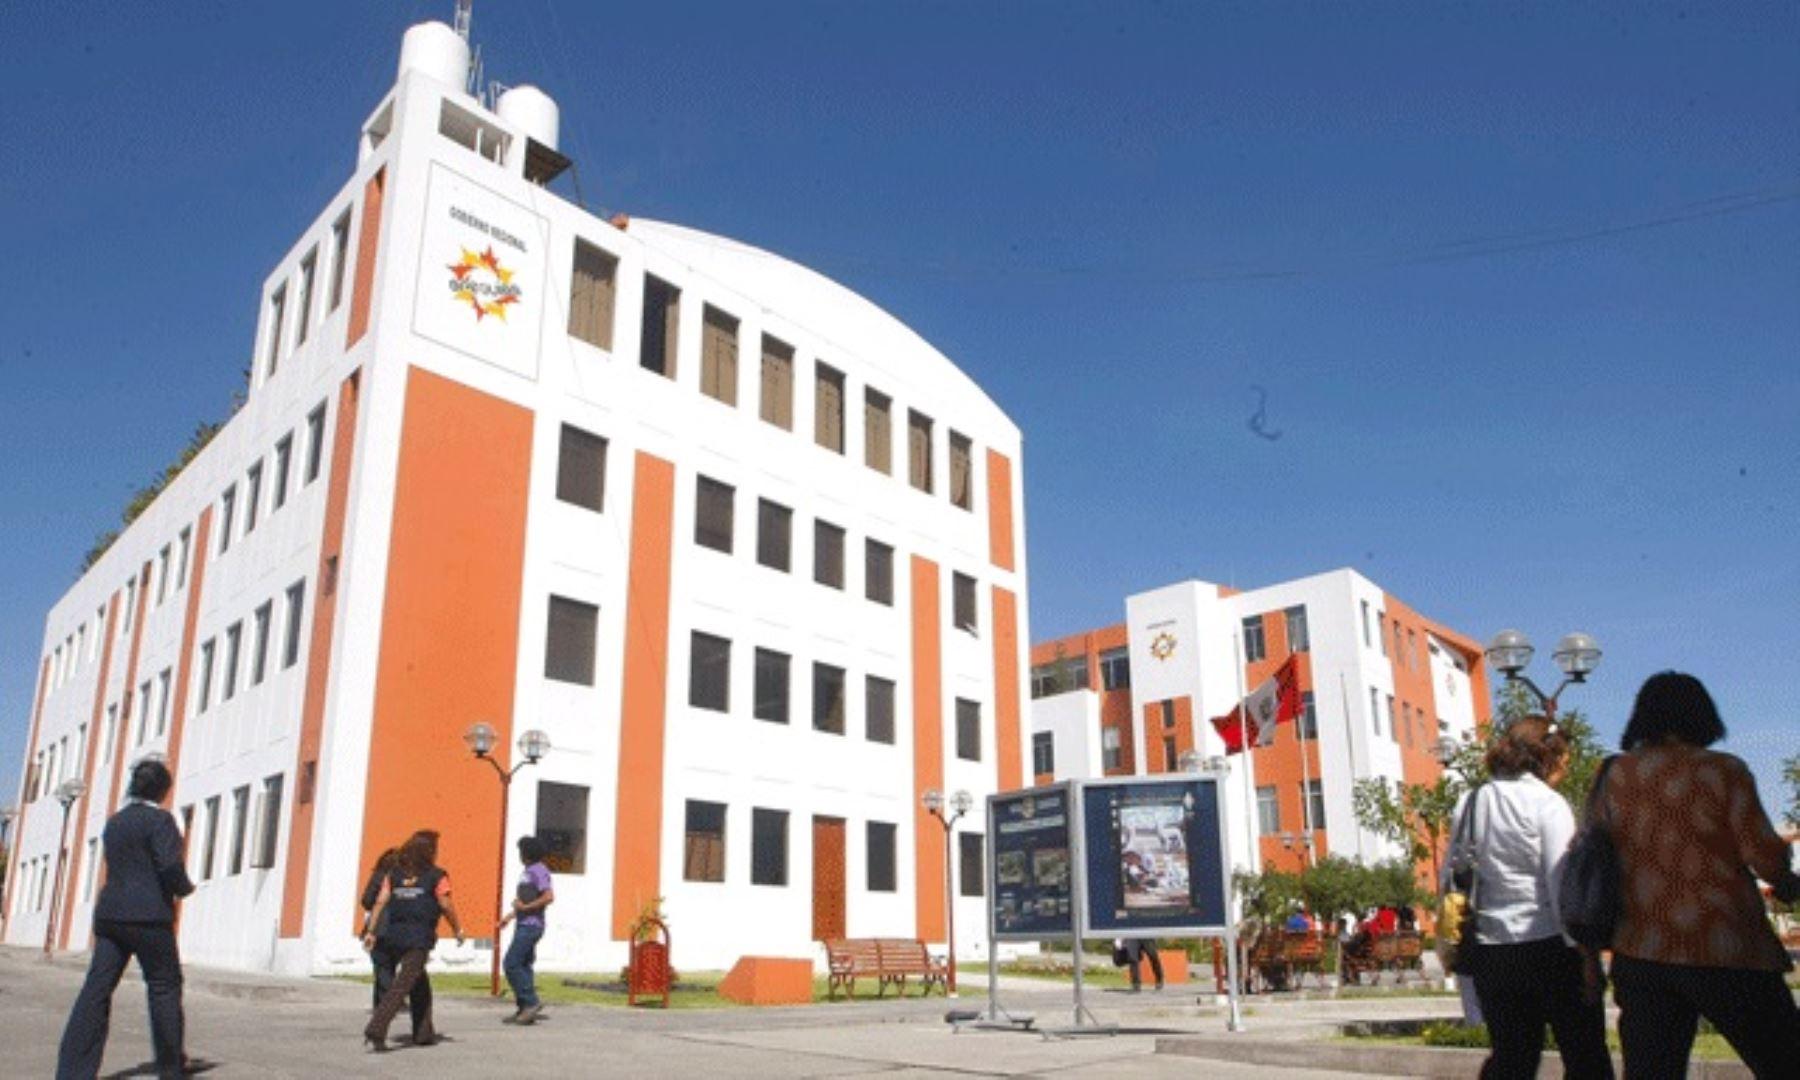 Elección de gobernador regional de Arequipa se definirá en segunda vuelta, revela la ODPE Arequipa. ANDINA